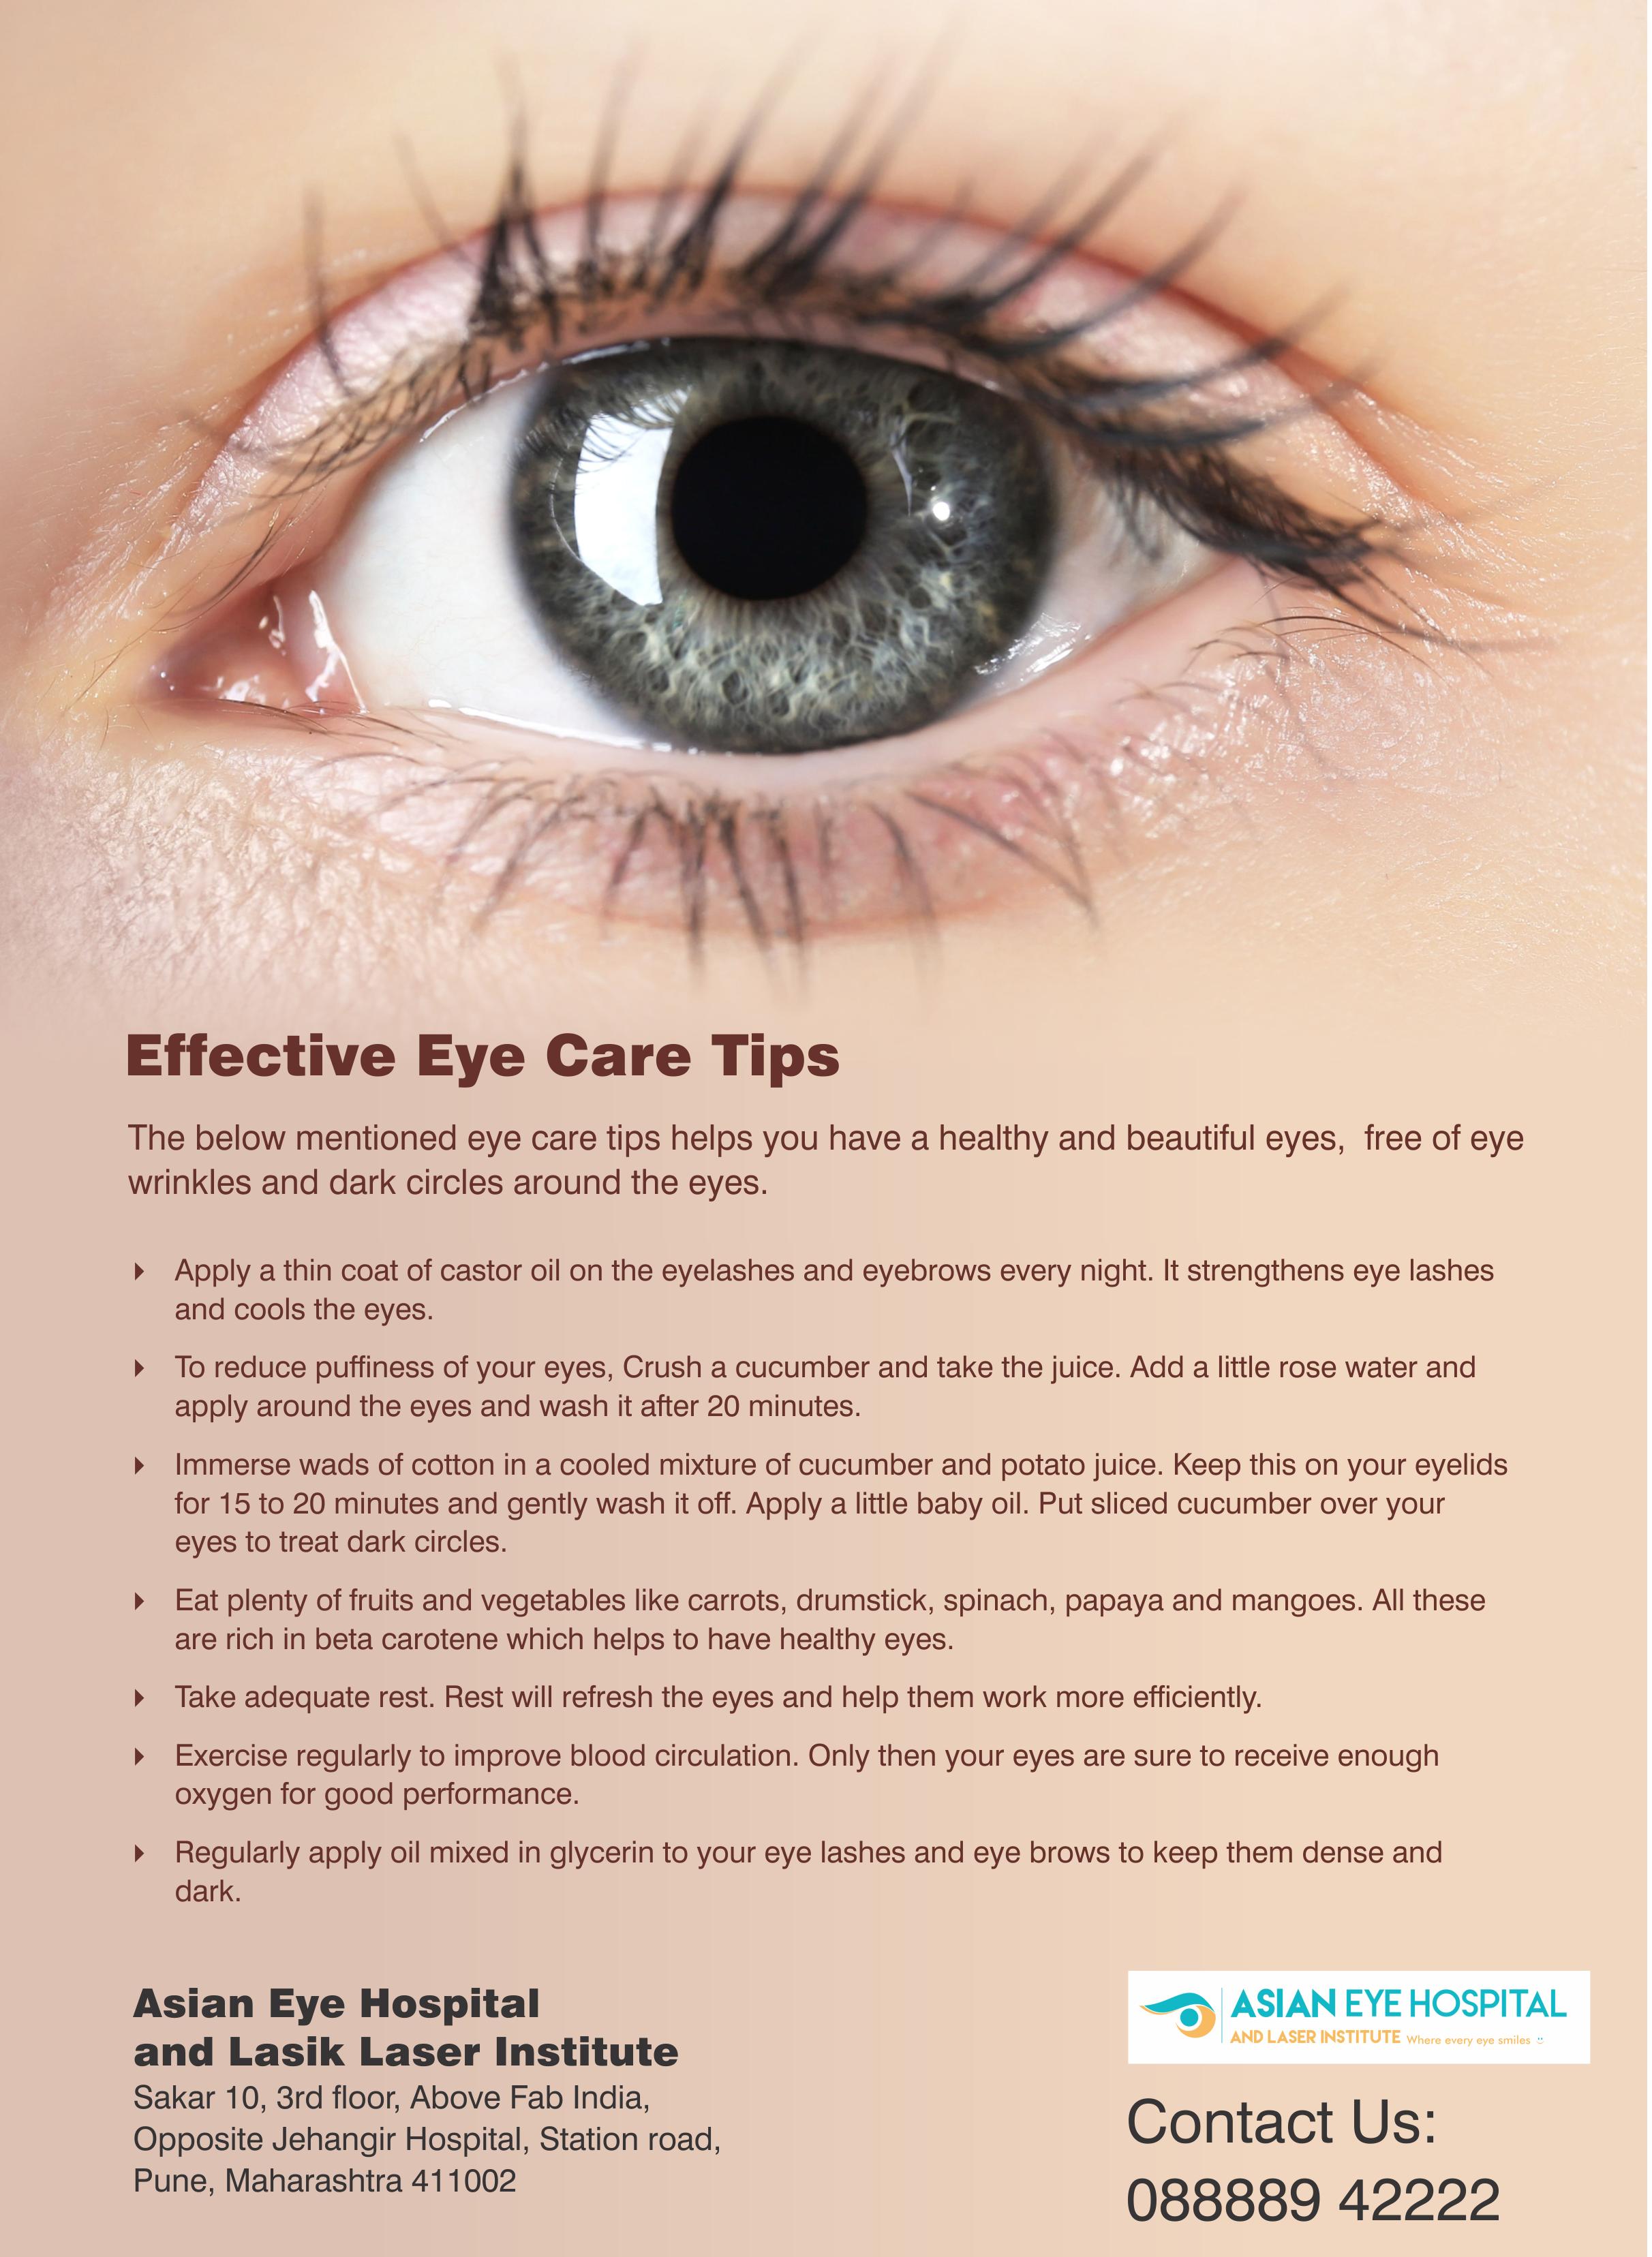 Effective Eye Care Tips - Asian Eye Hospital  Eye wrinkle, Eye